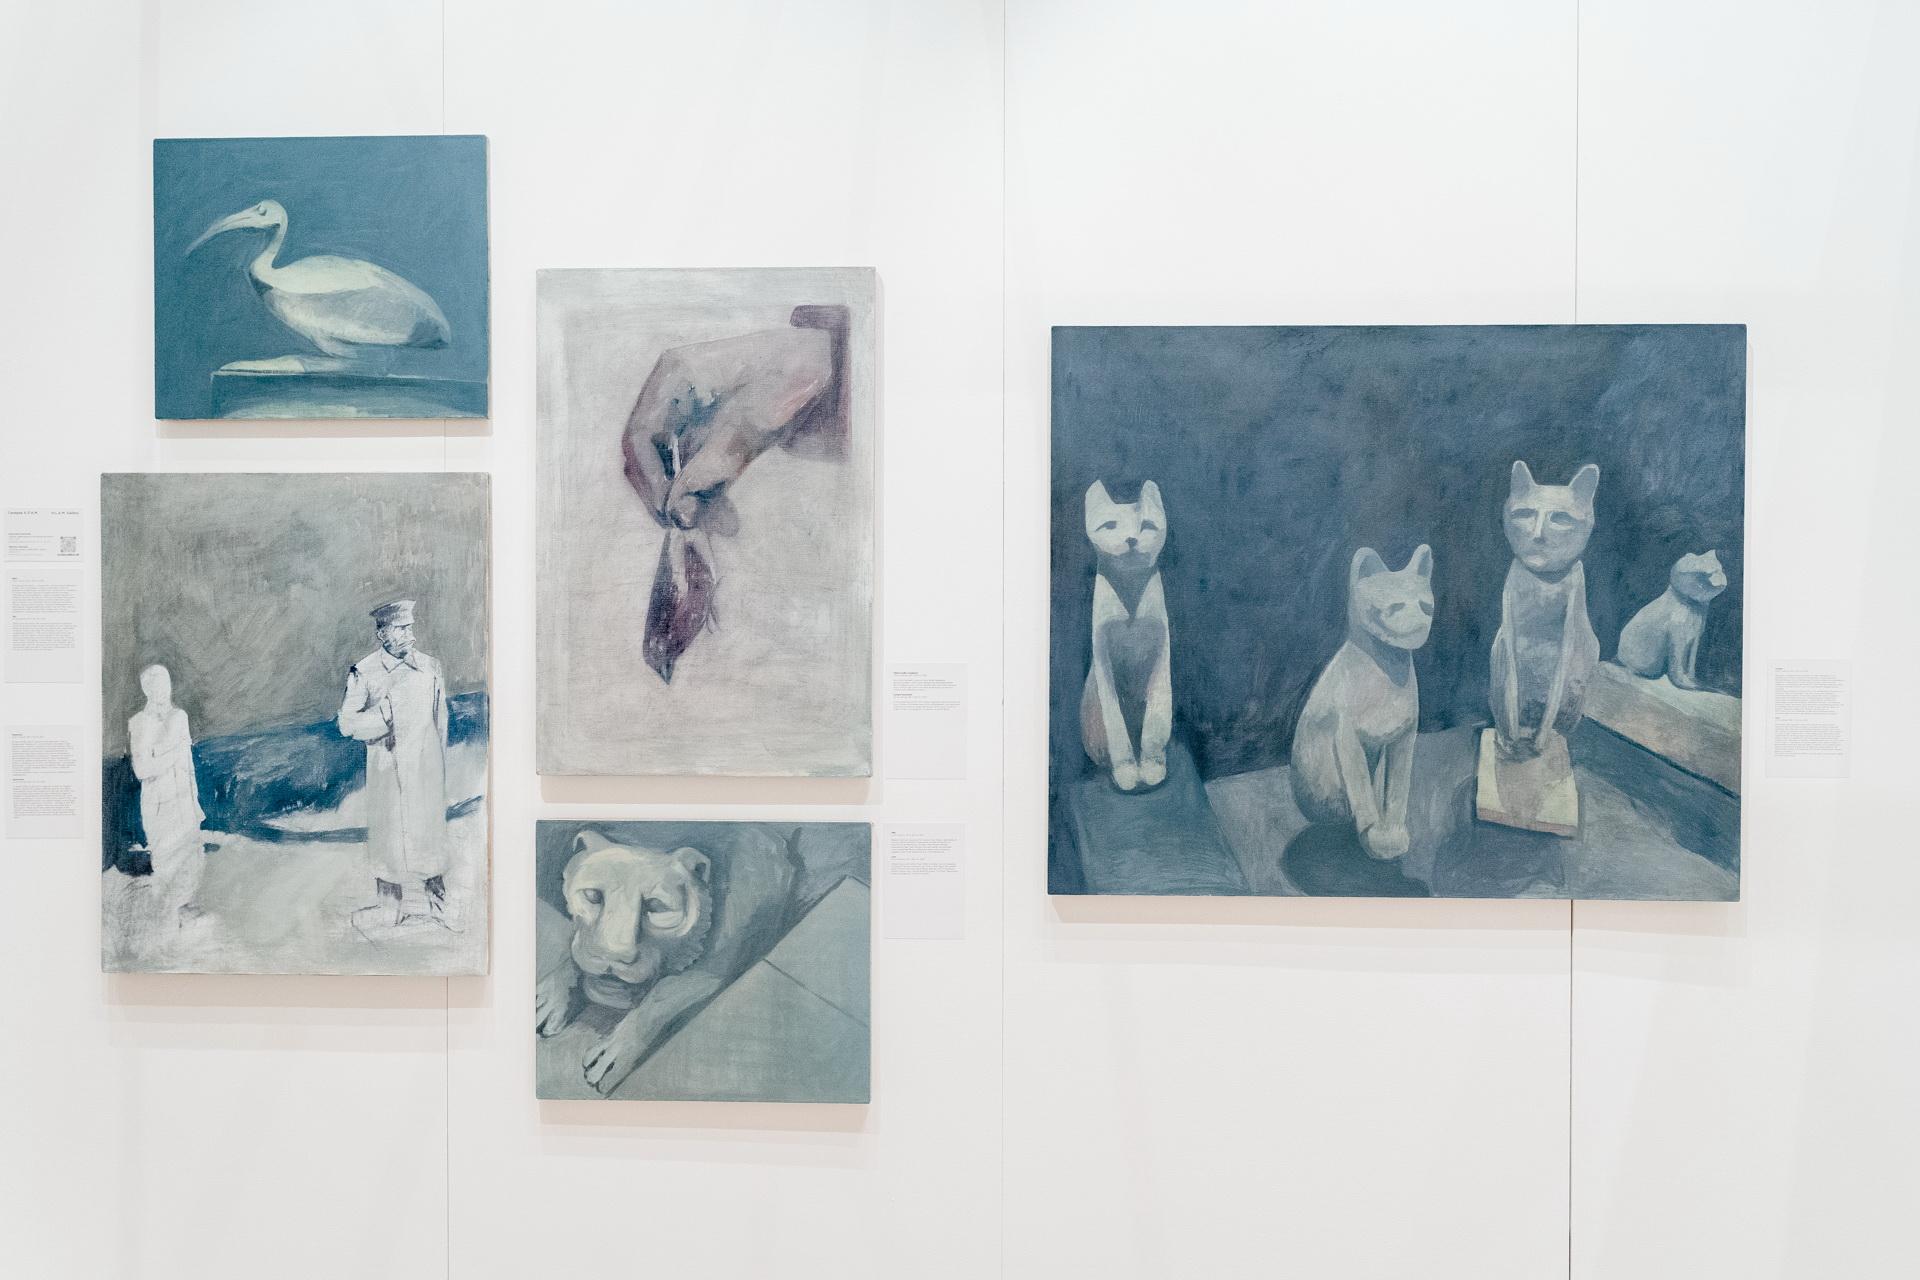 Работы Николая Алексеева на стенде галереи «Х.Л.А.М.»